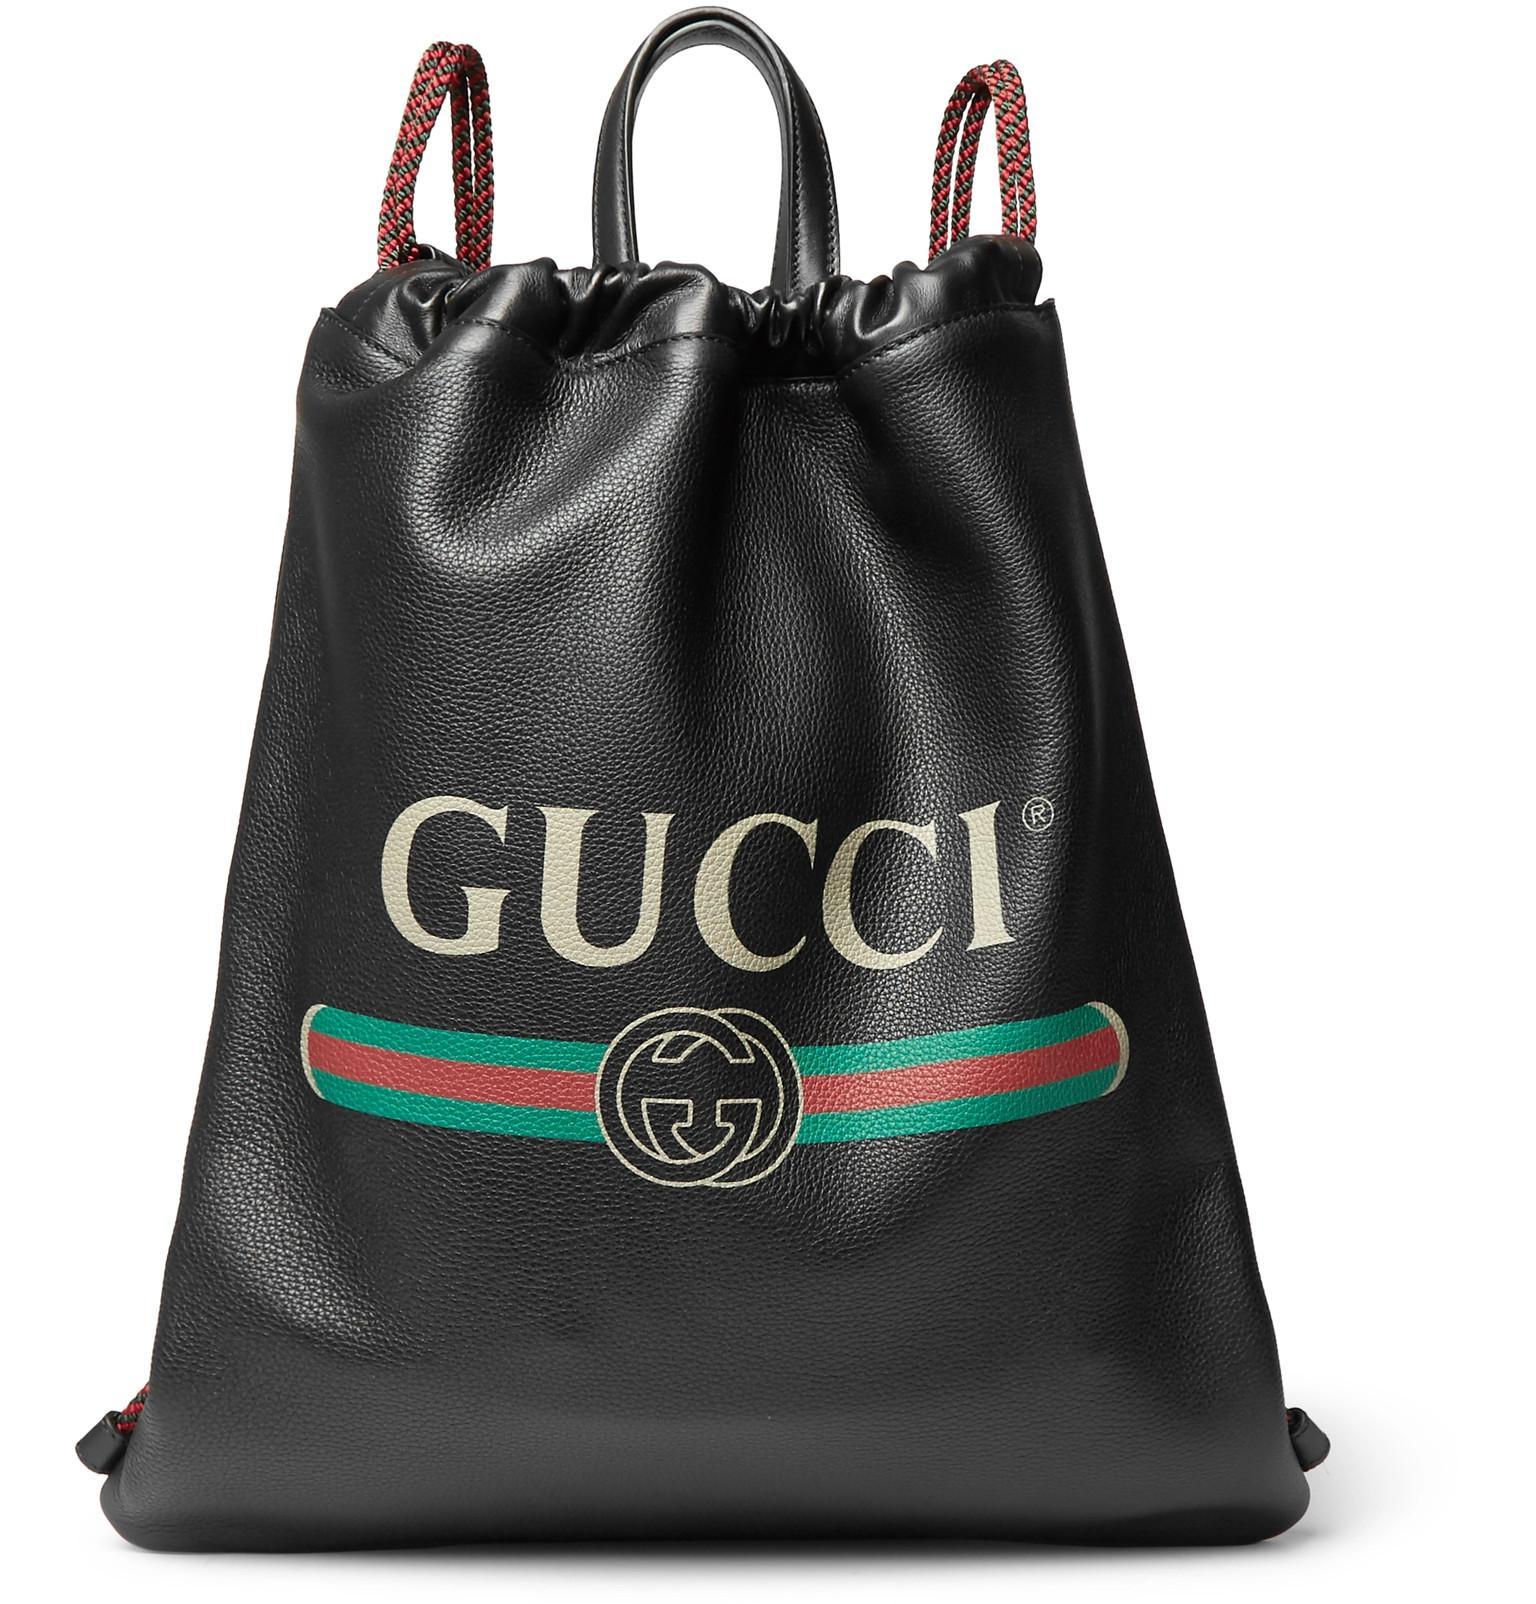 e591458b26ae Gucci - Black Printed Full-grain Leather Backpack for Men - Lyst. View  fullscreen